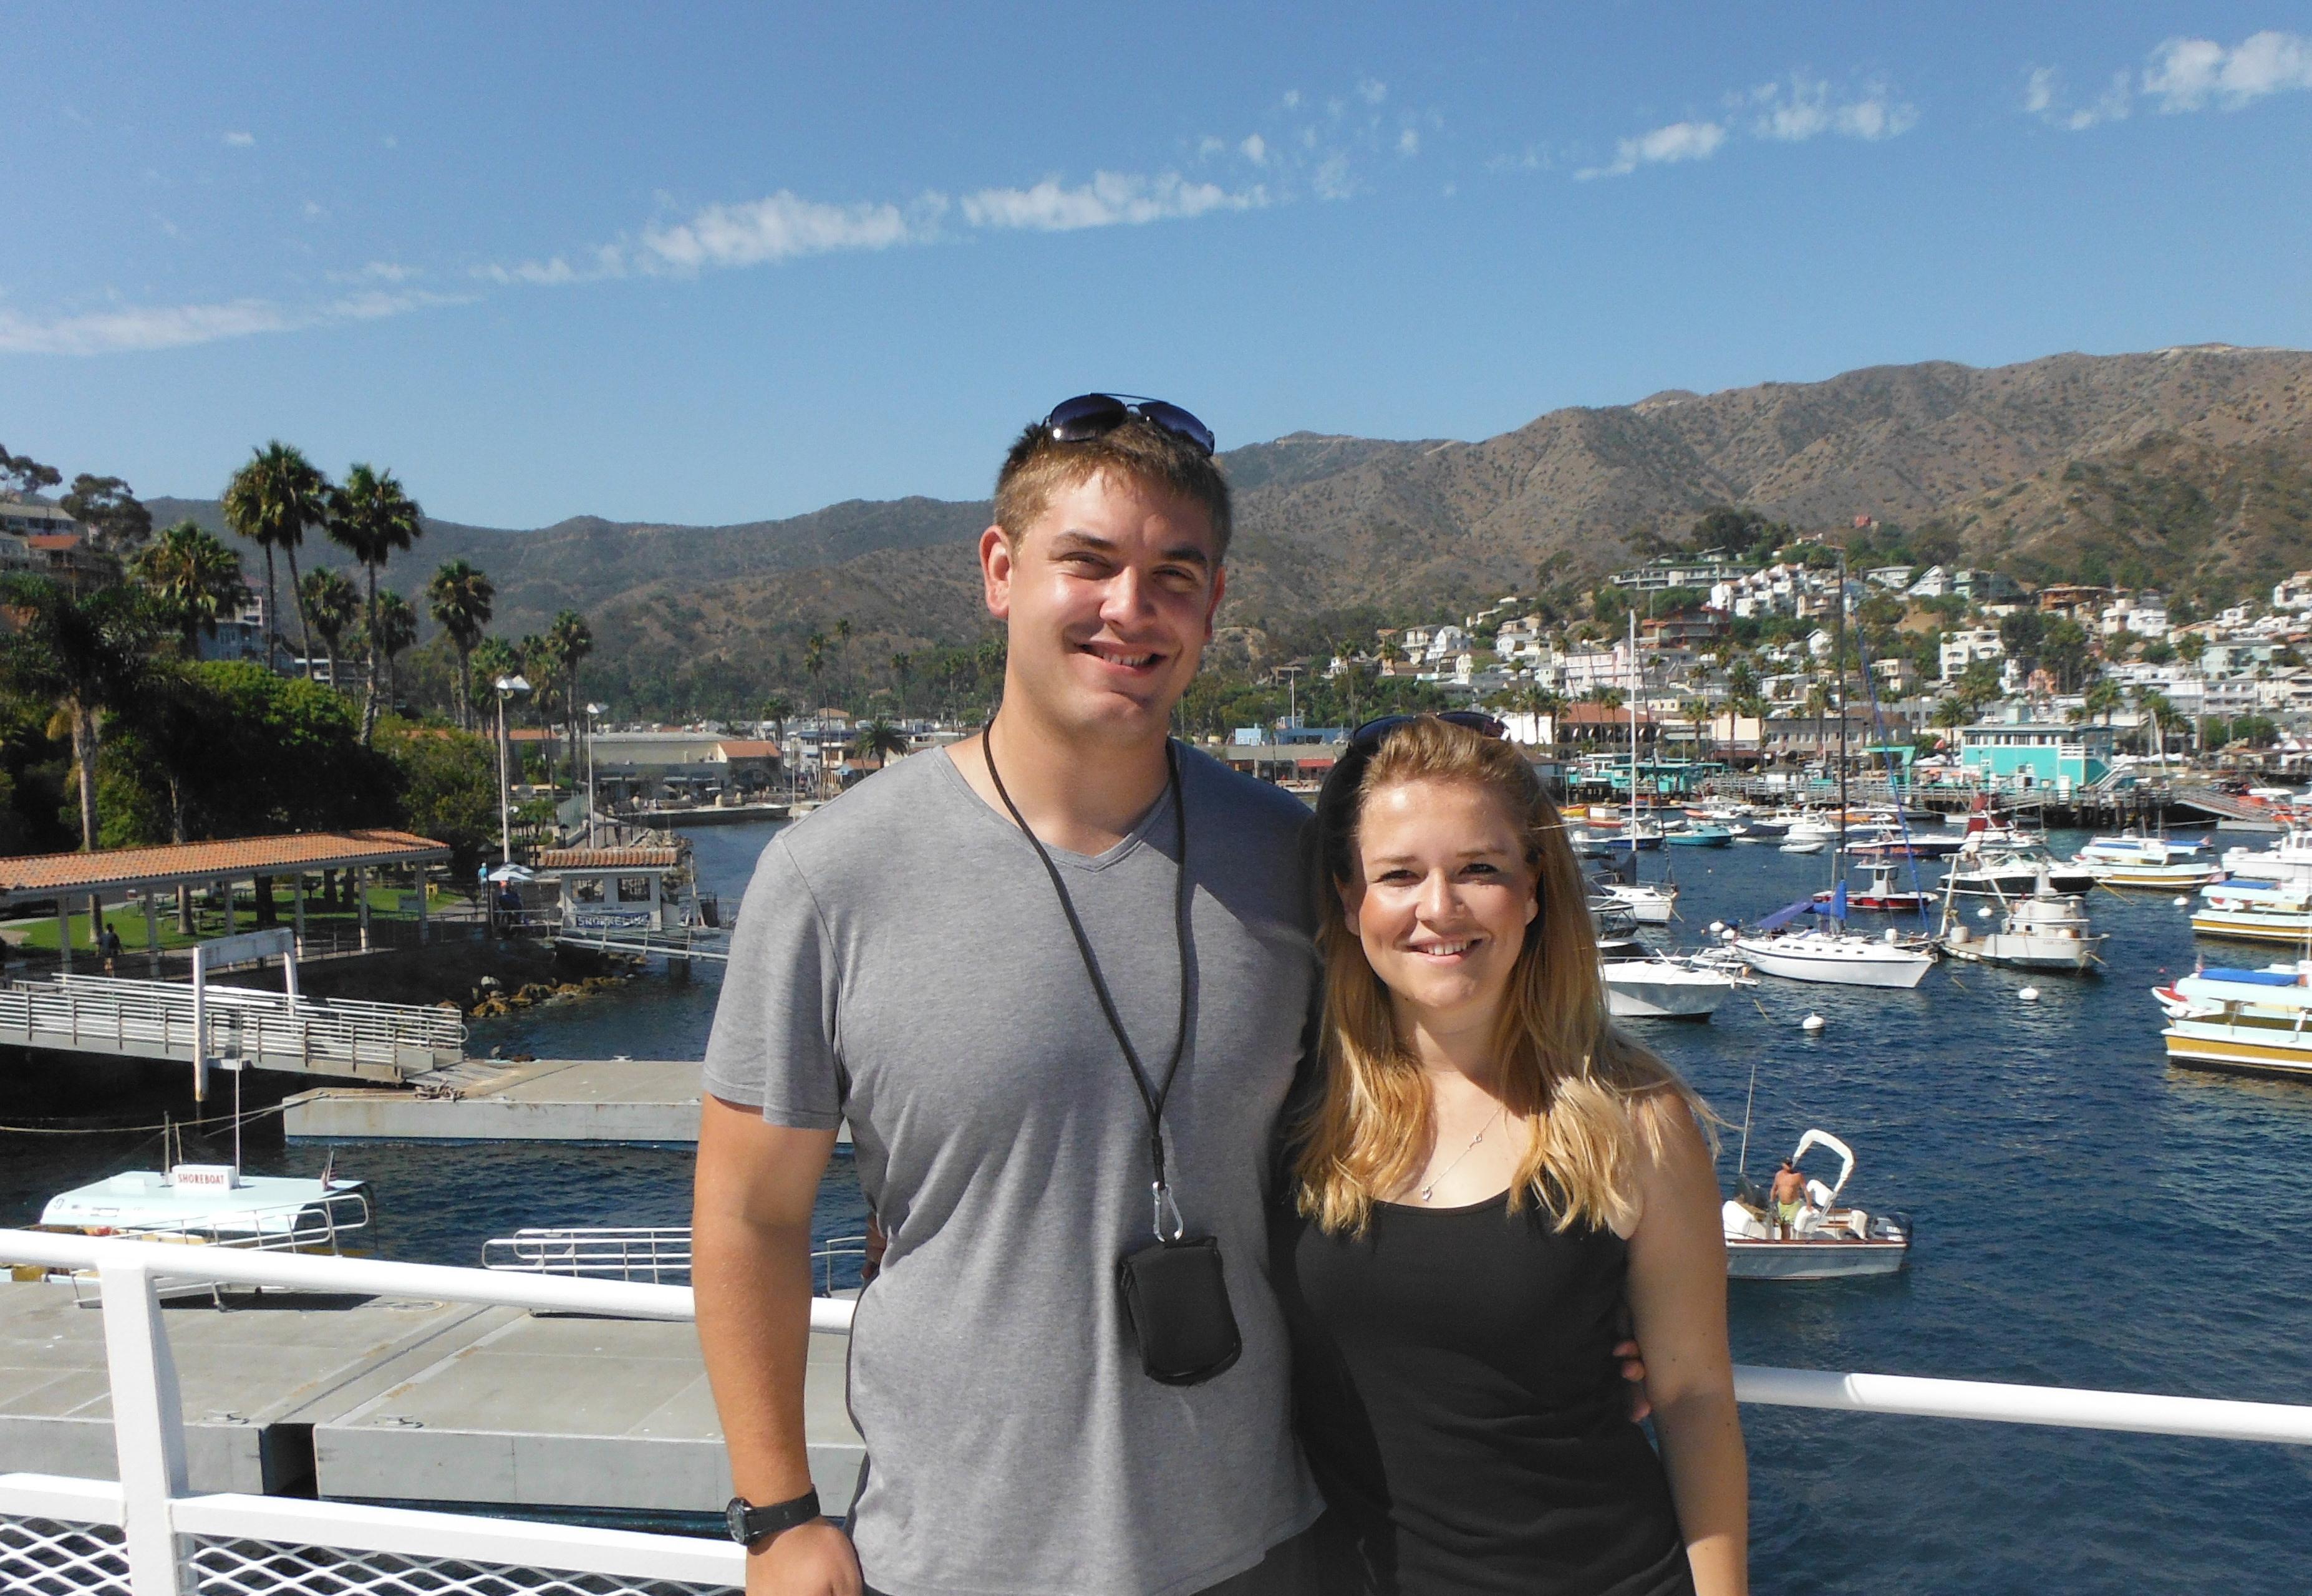 Image 2 of Tatyana and Steven   San Francisco Marrige Proposal